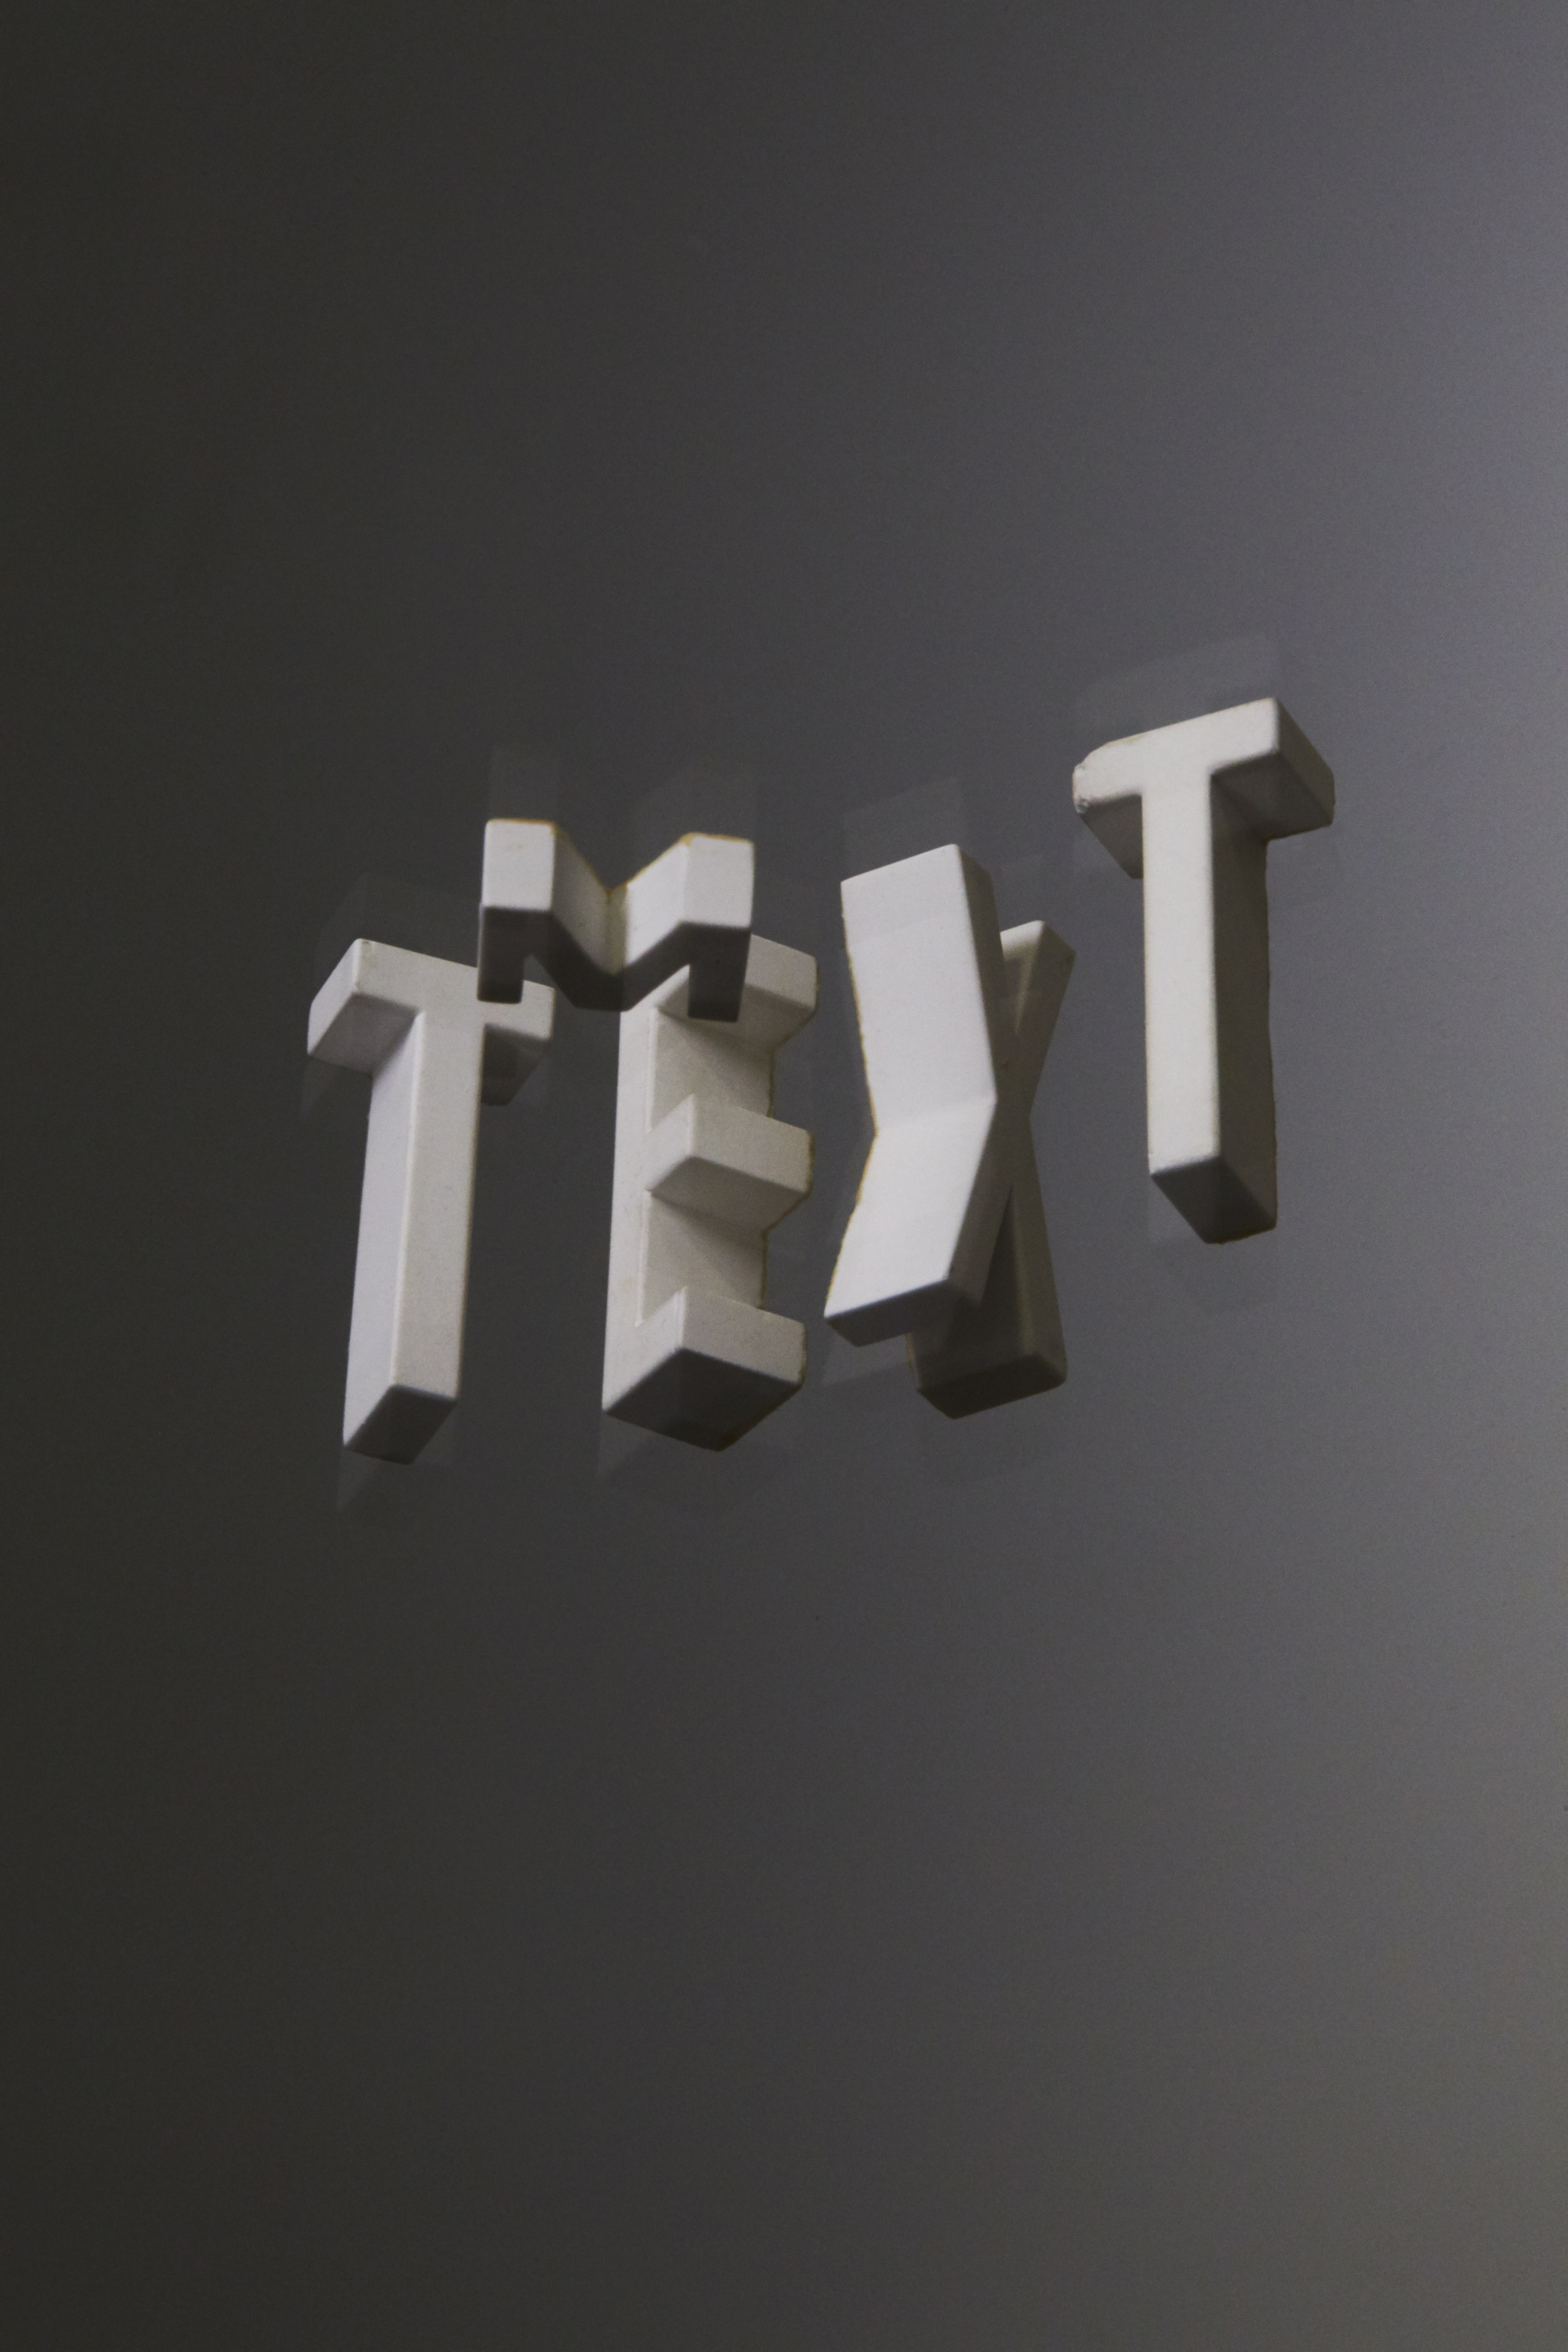 Paul Orenstein, Text Me, 2020